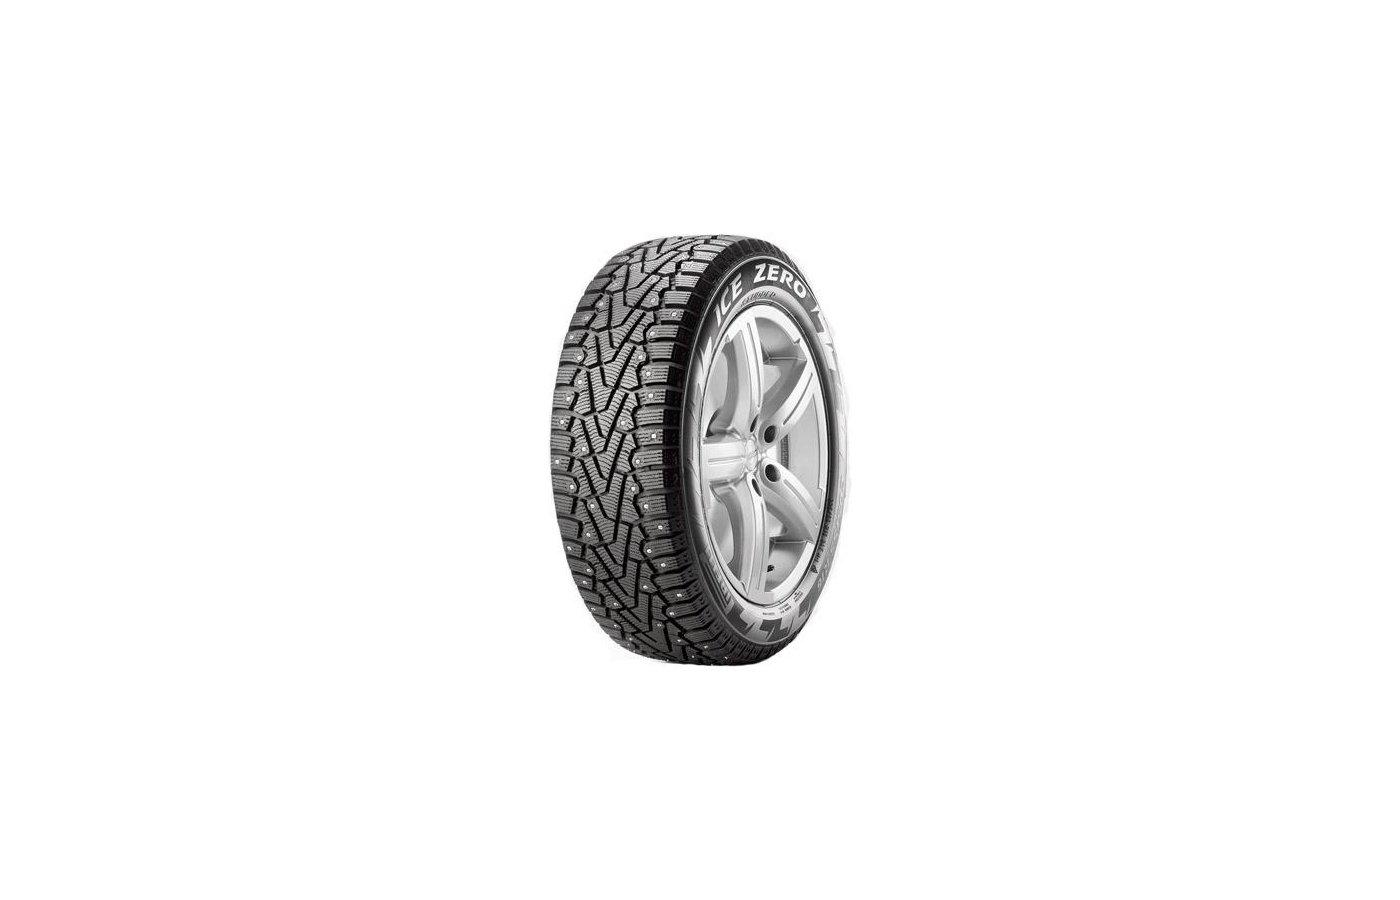 Шина Pirelli Ice Zero 235/55 R17 TL 103T XL шип